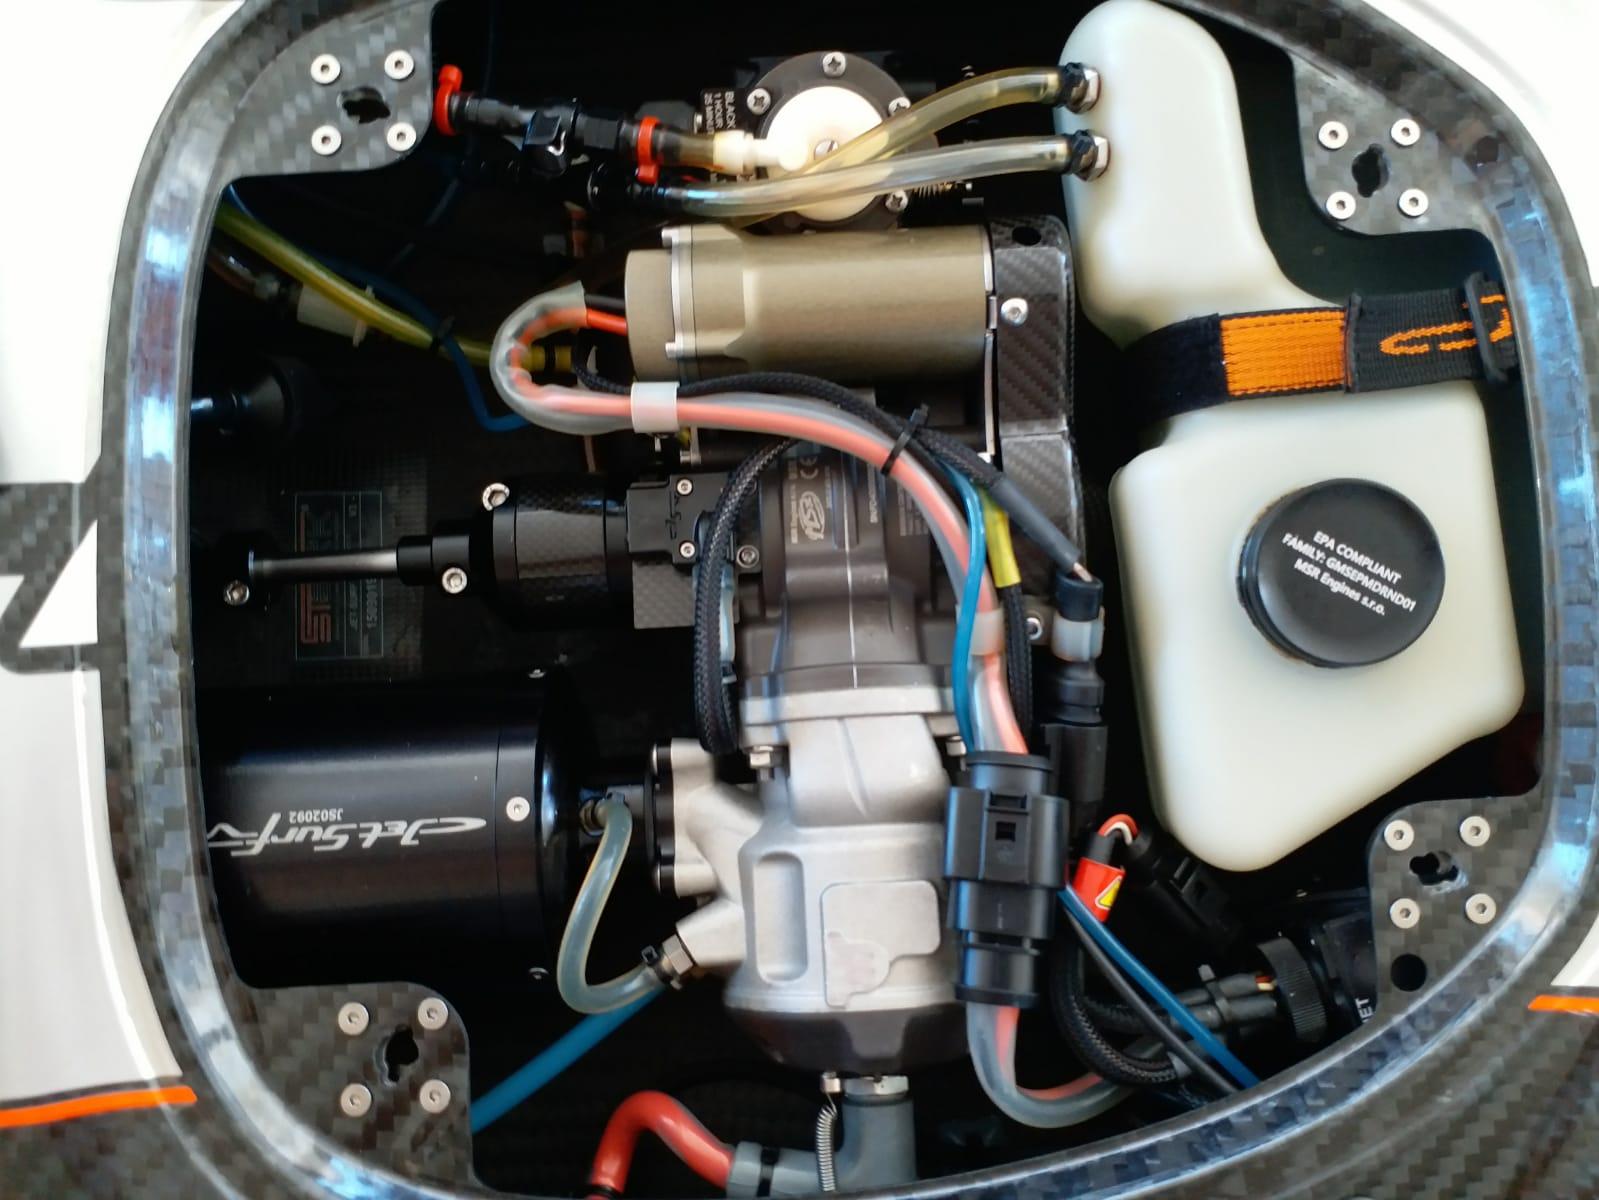 2016 JetSurf Factory GP (90% New)